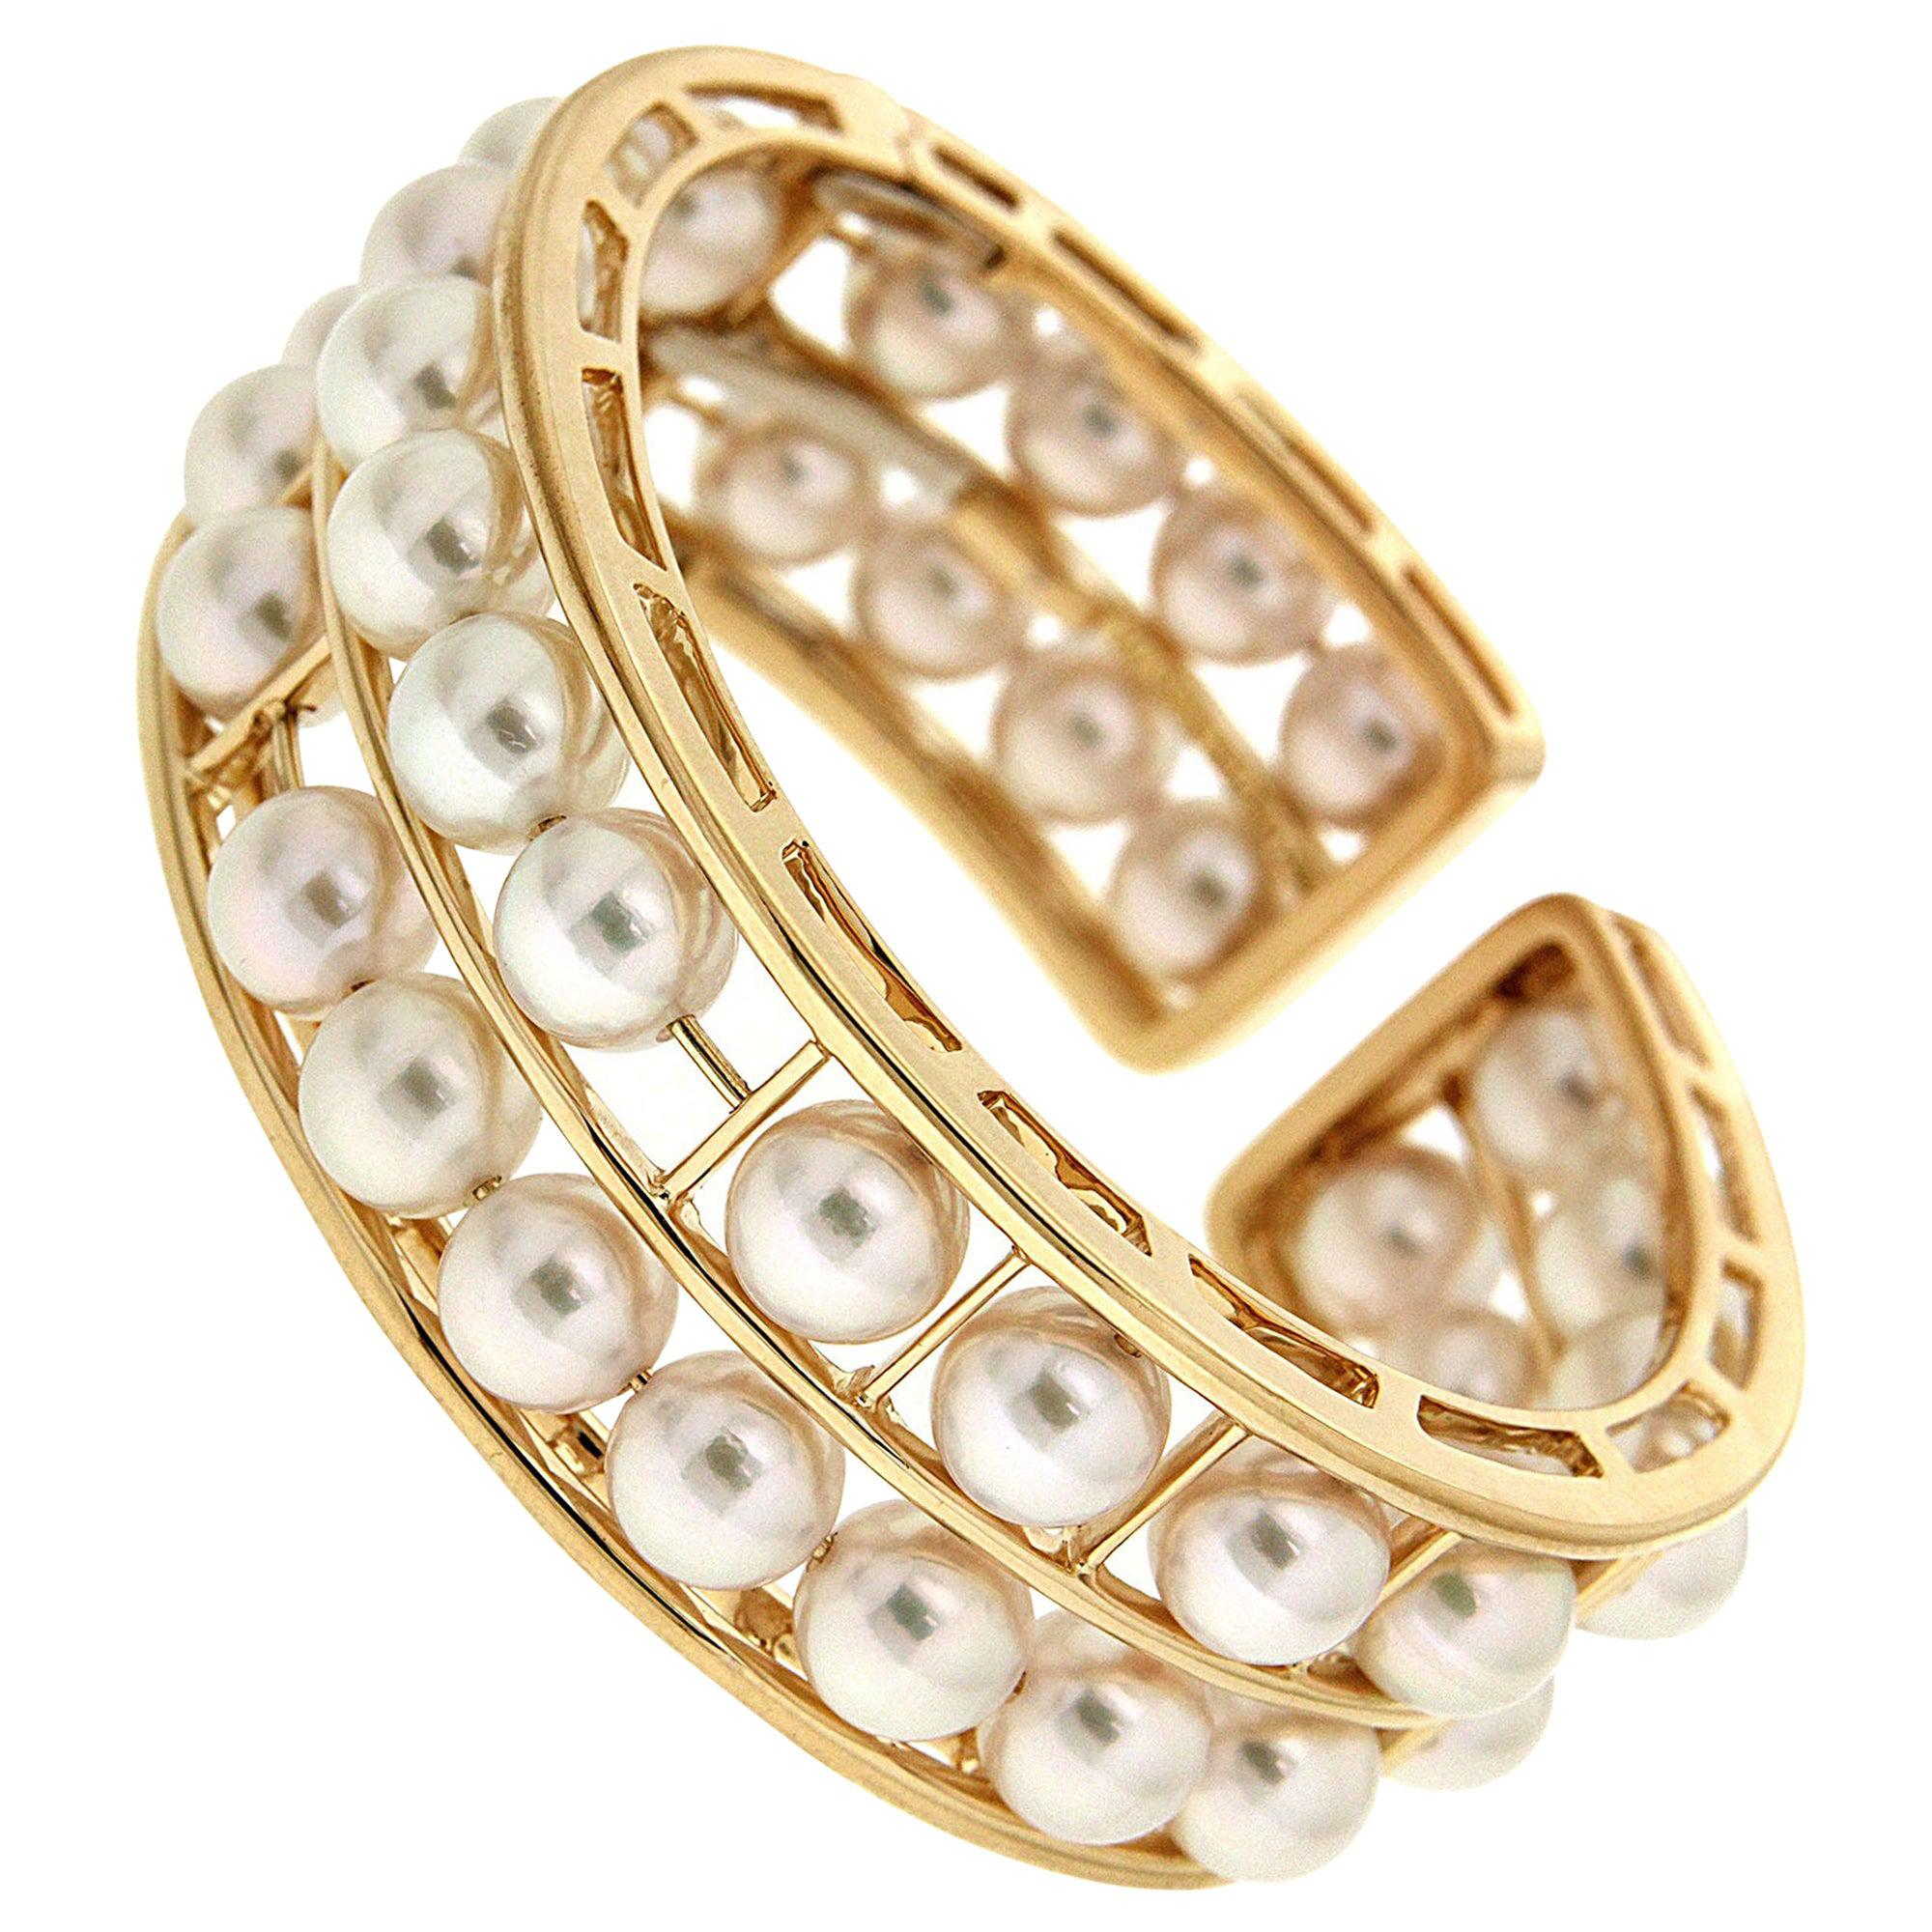 Valentin Magro Pearl 18 Karat Yellow Gold Cuff Bracelet